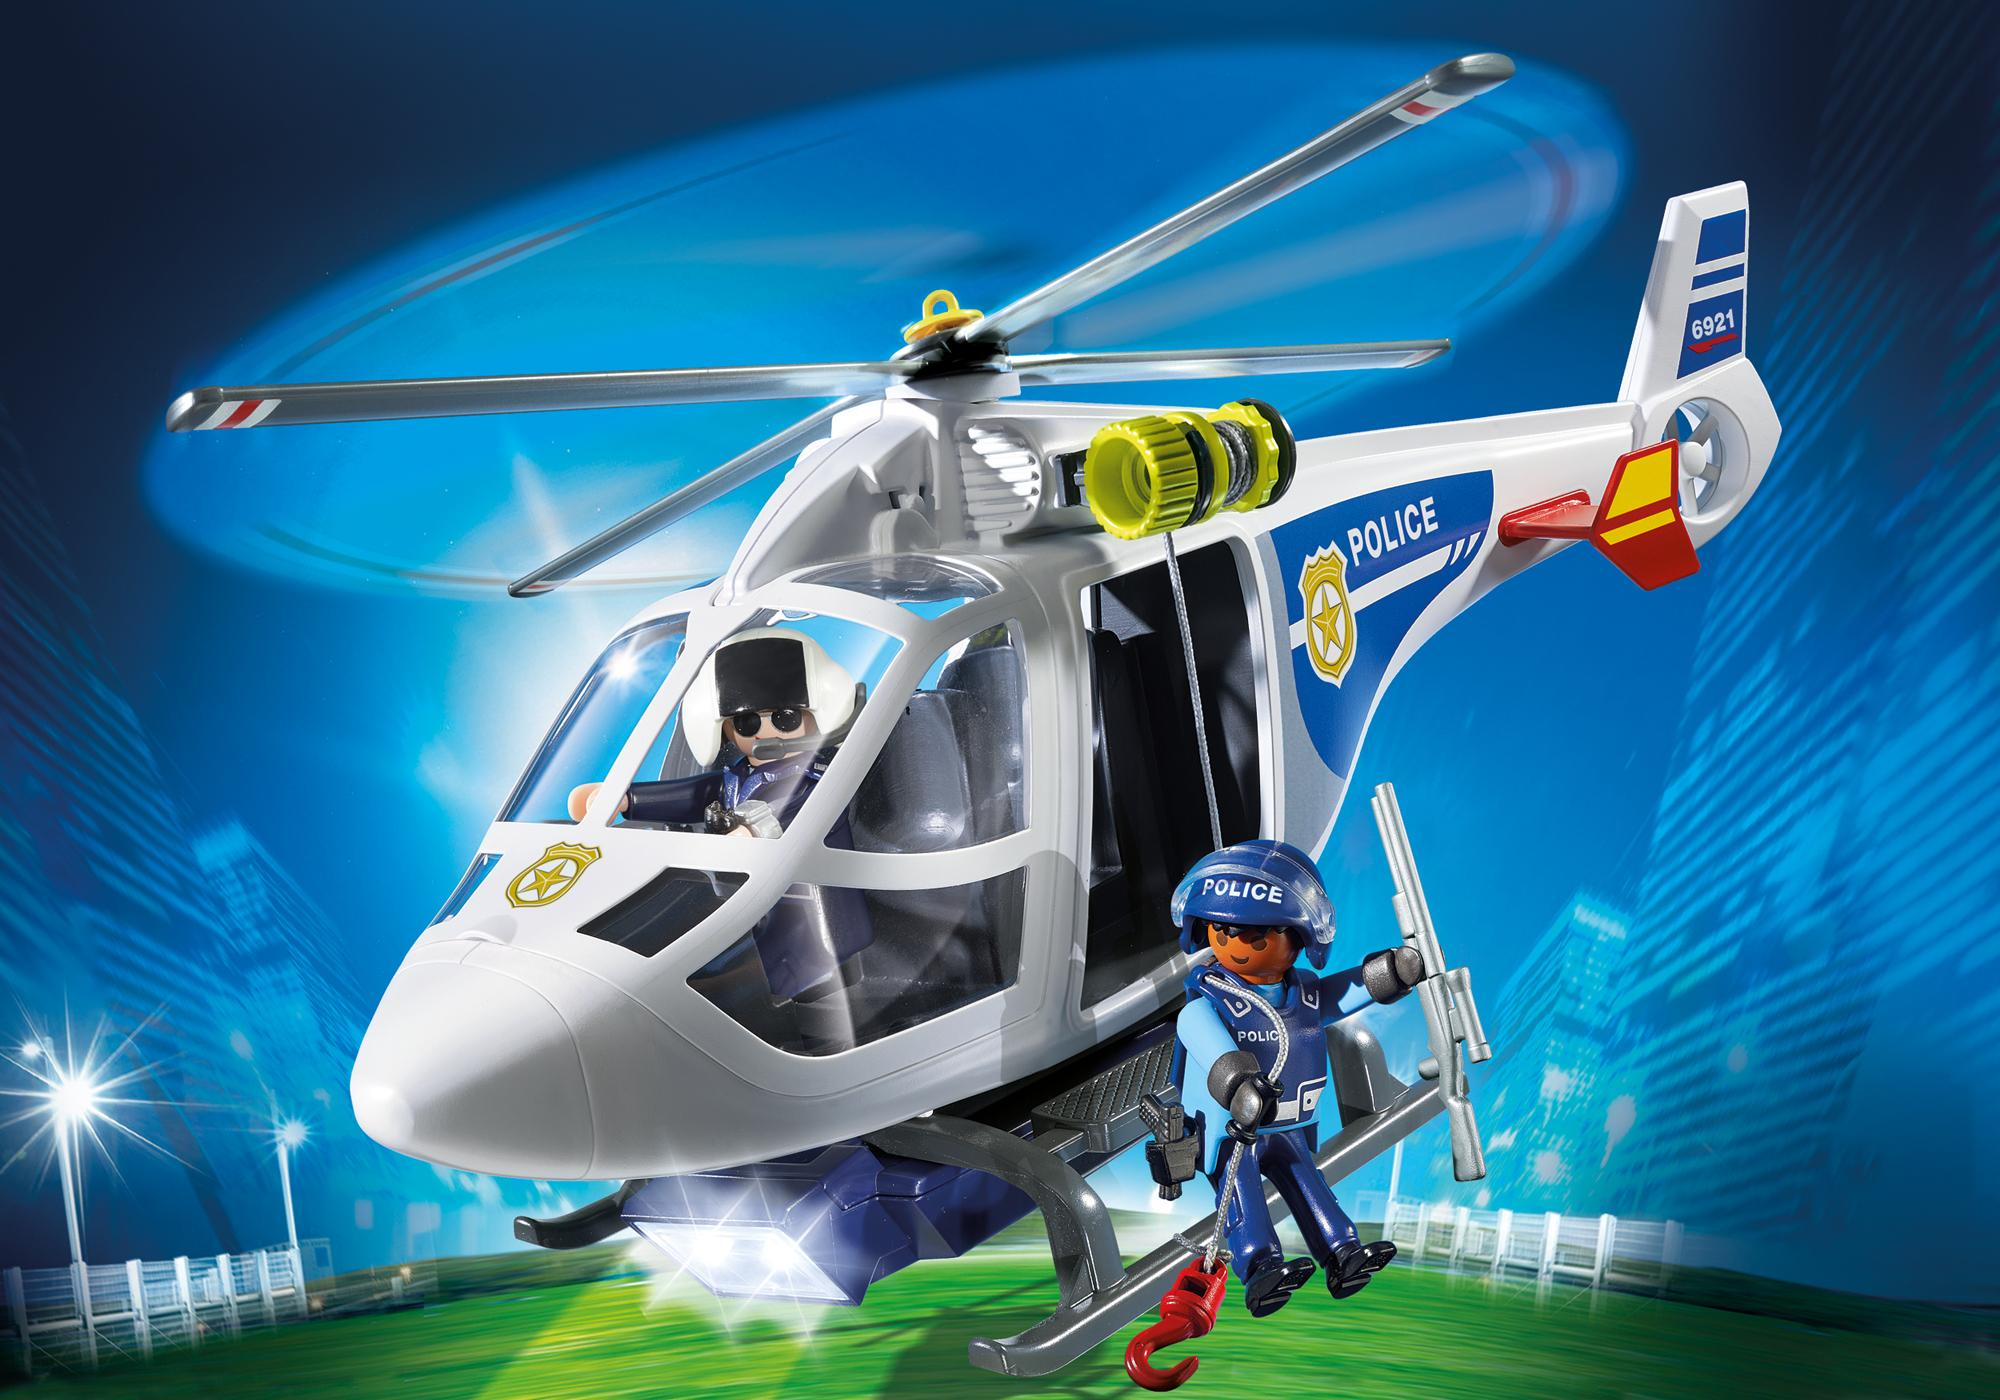 6921_product_detail/Int. Polizei-Helikopter mit LED-Suchscheinwerfer